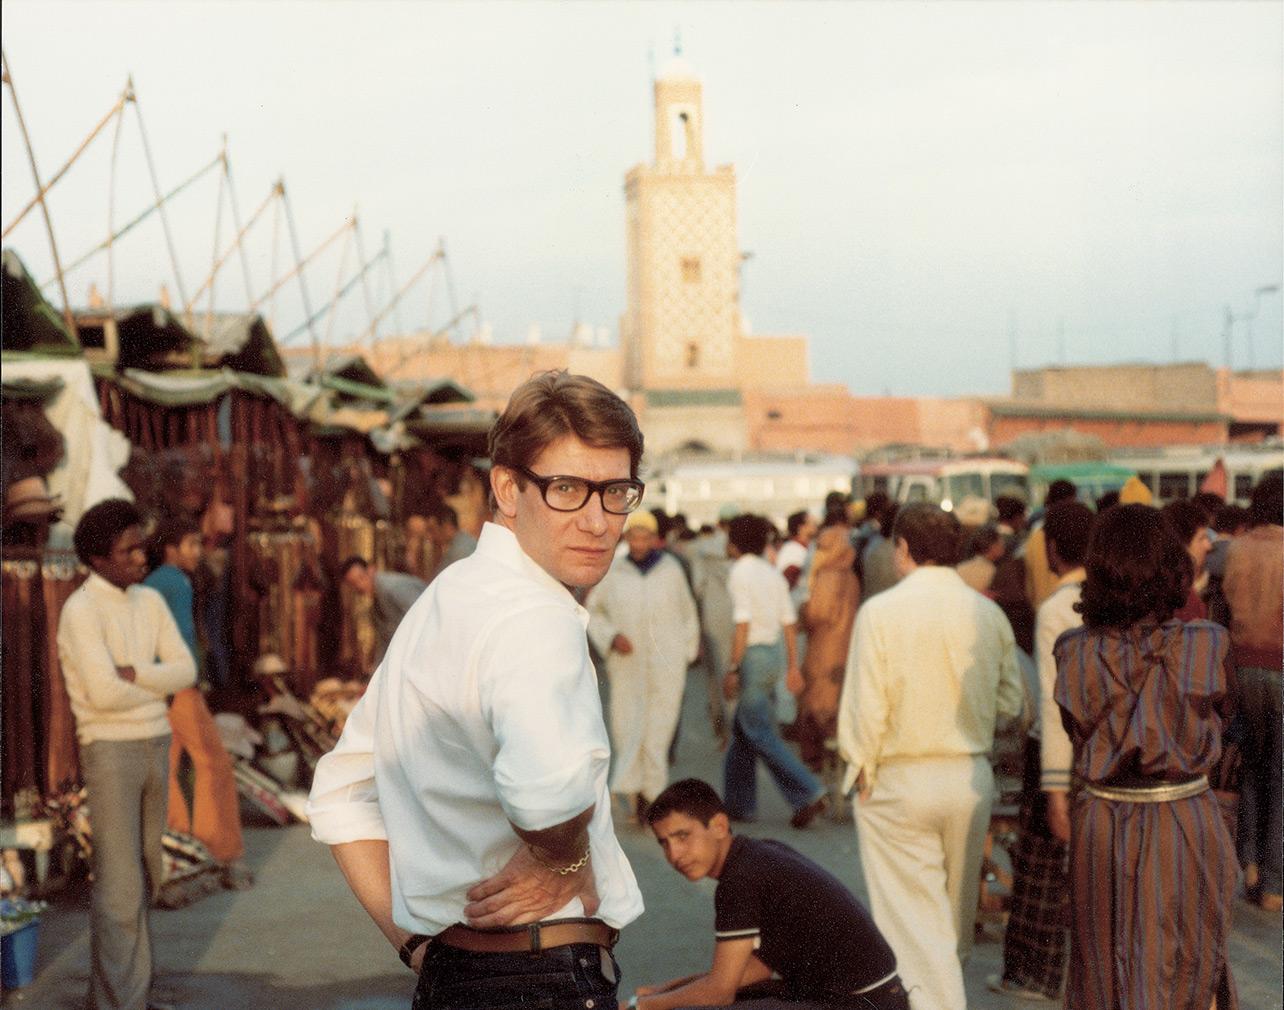 Yves Saint Laurent, Jemaa el-Fnaa square (c) Reginald Gray